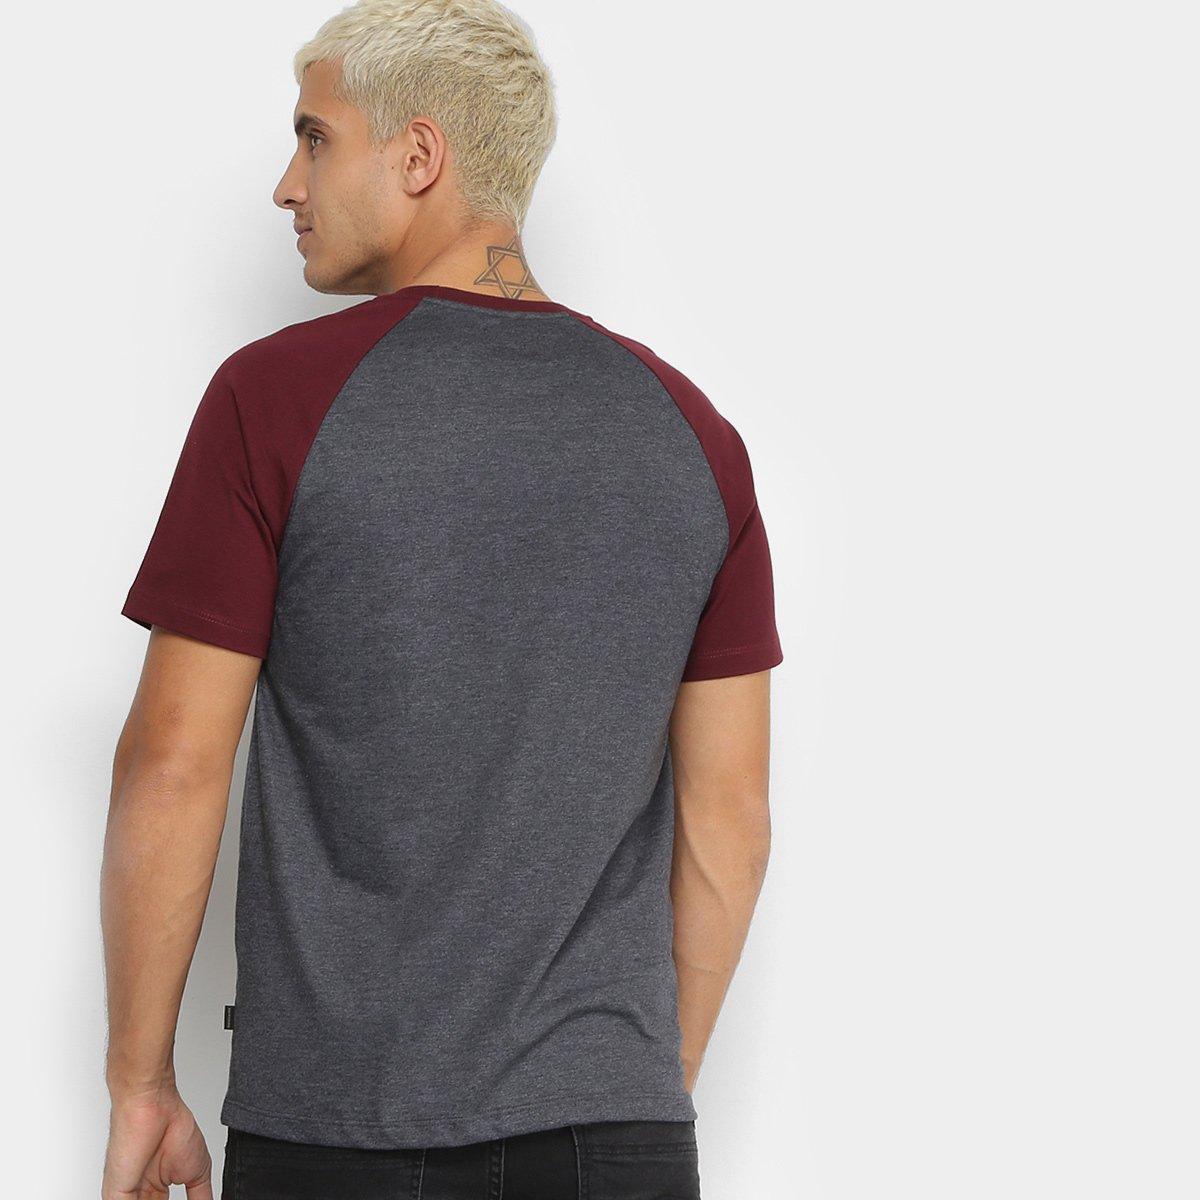 9ce5d65656444 Camiseta Quiksilver Especial Everyday Raglan Masculina  Camiseta Quiksilver  Especial Everyday Raglan Masculina ...